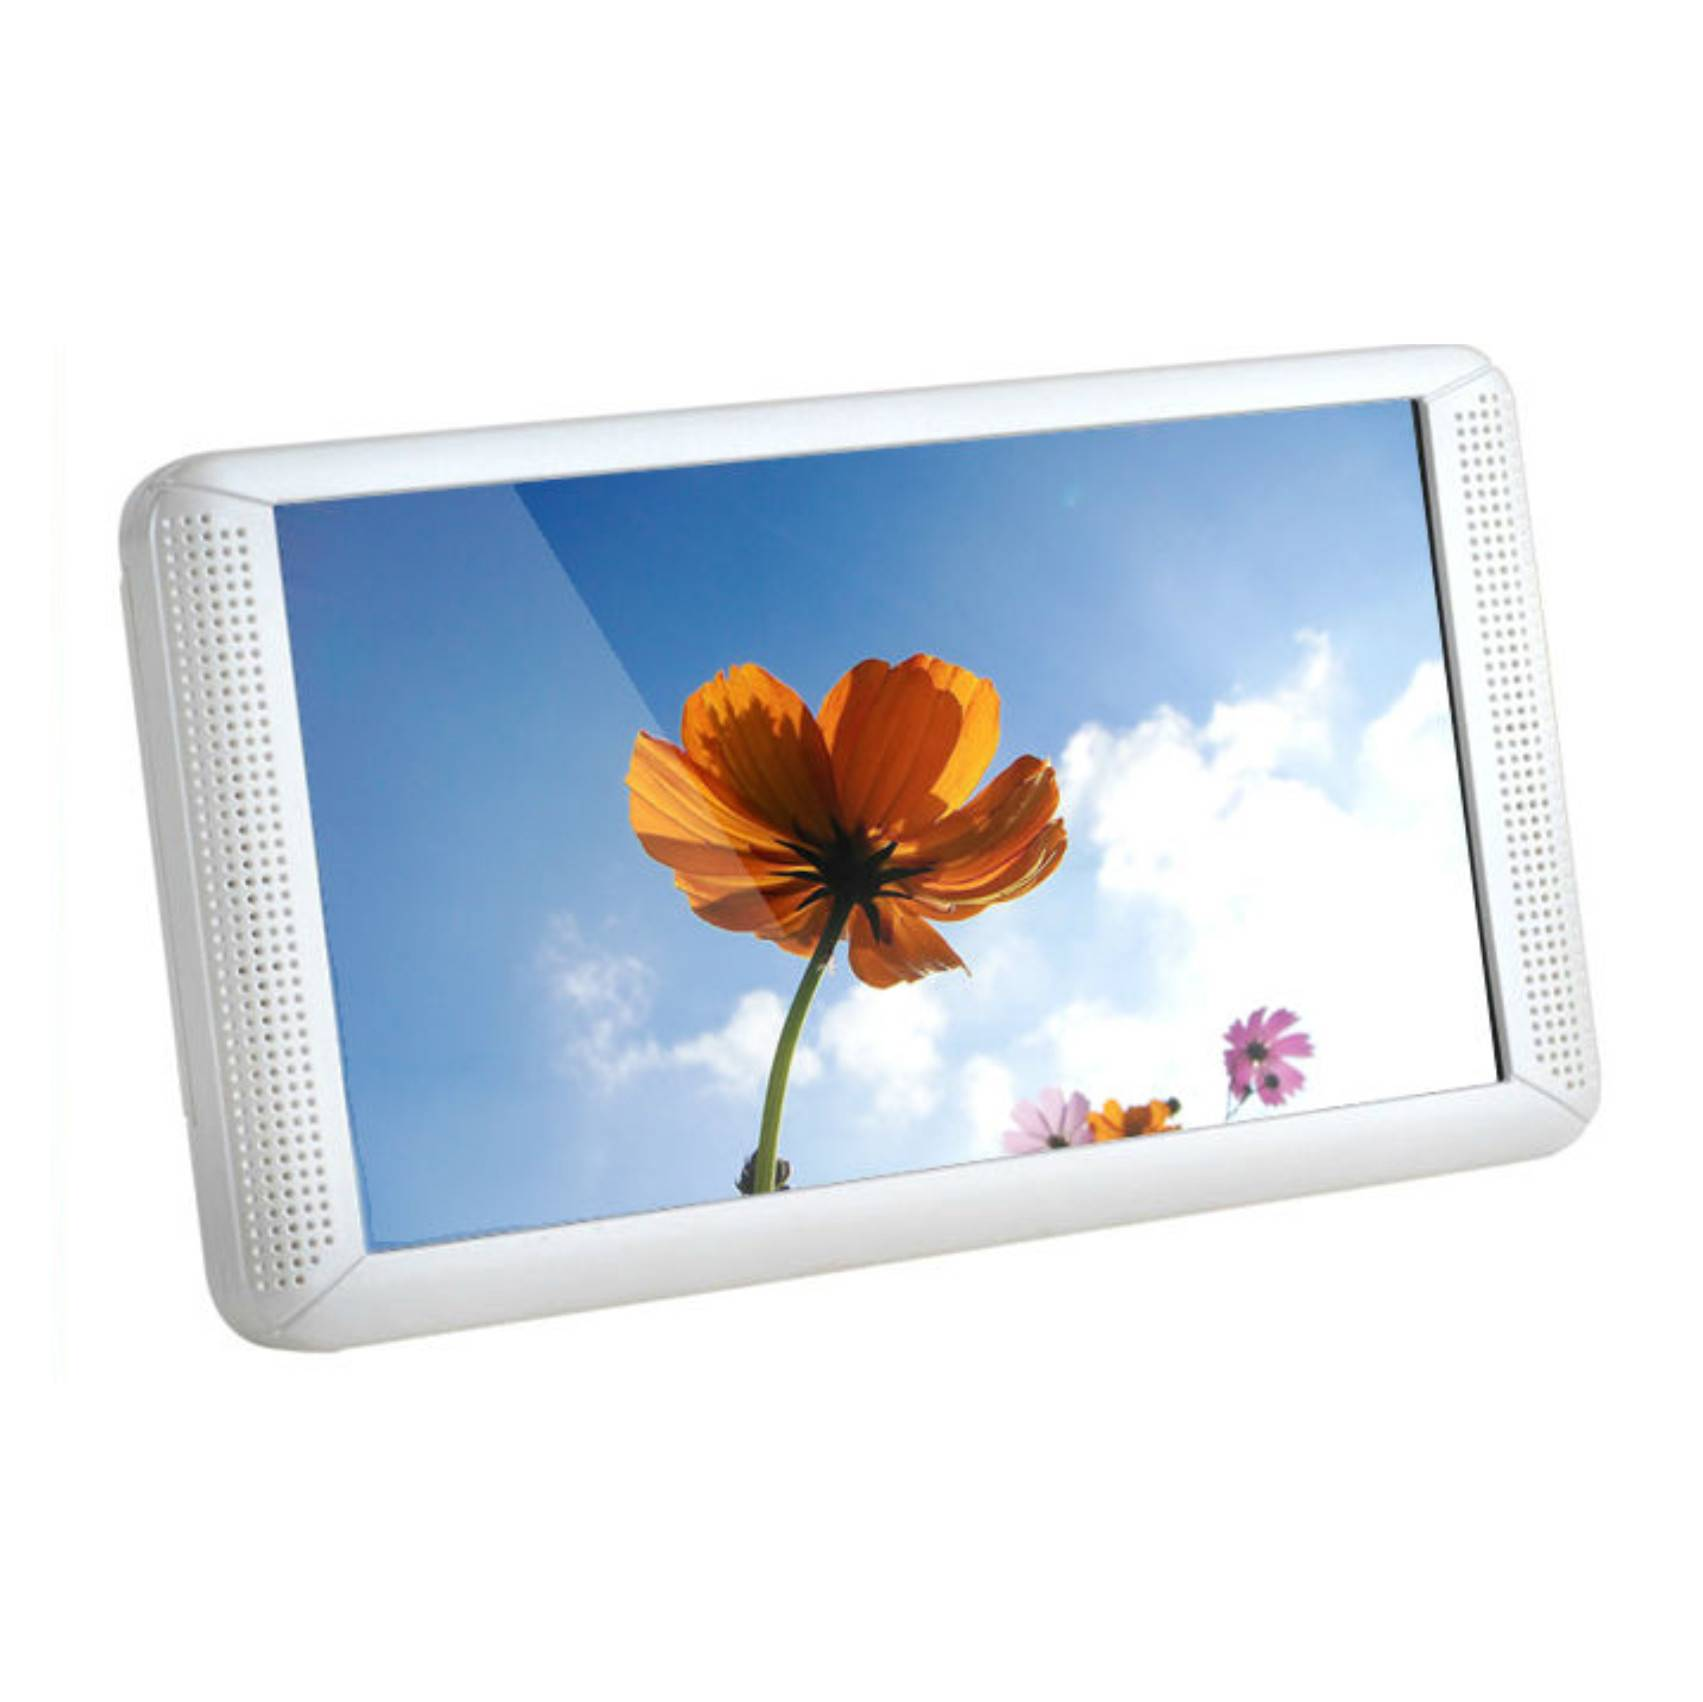 7inch Standard plastic shell wall/desk/shelf instalation LCD Advertising screen Hot Sales digital bi